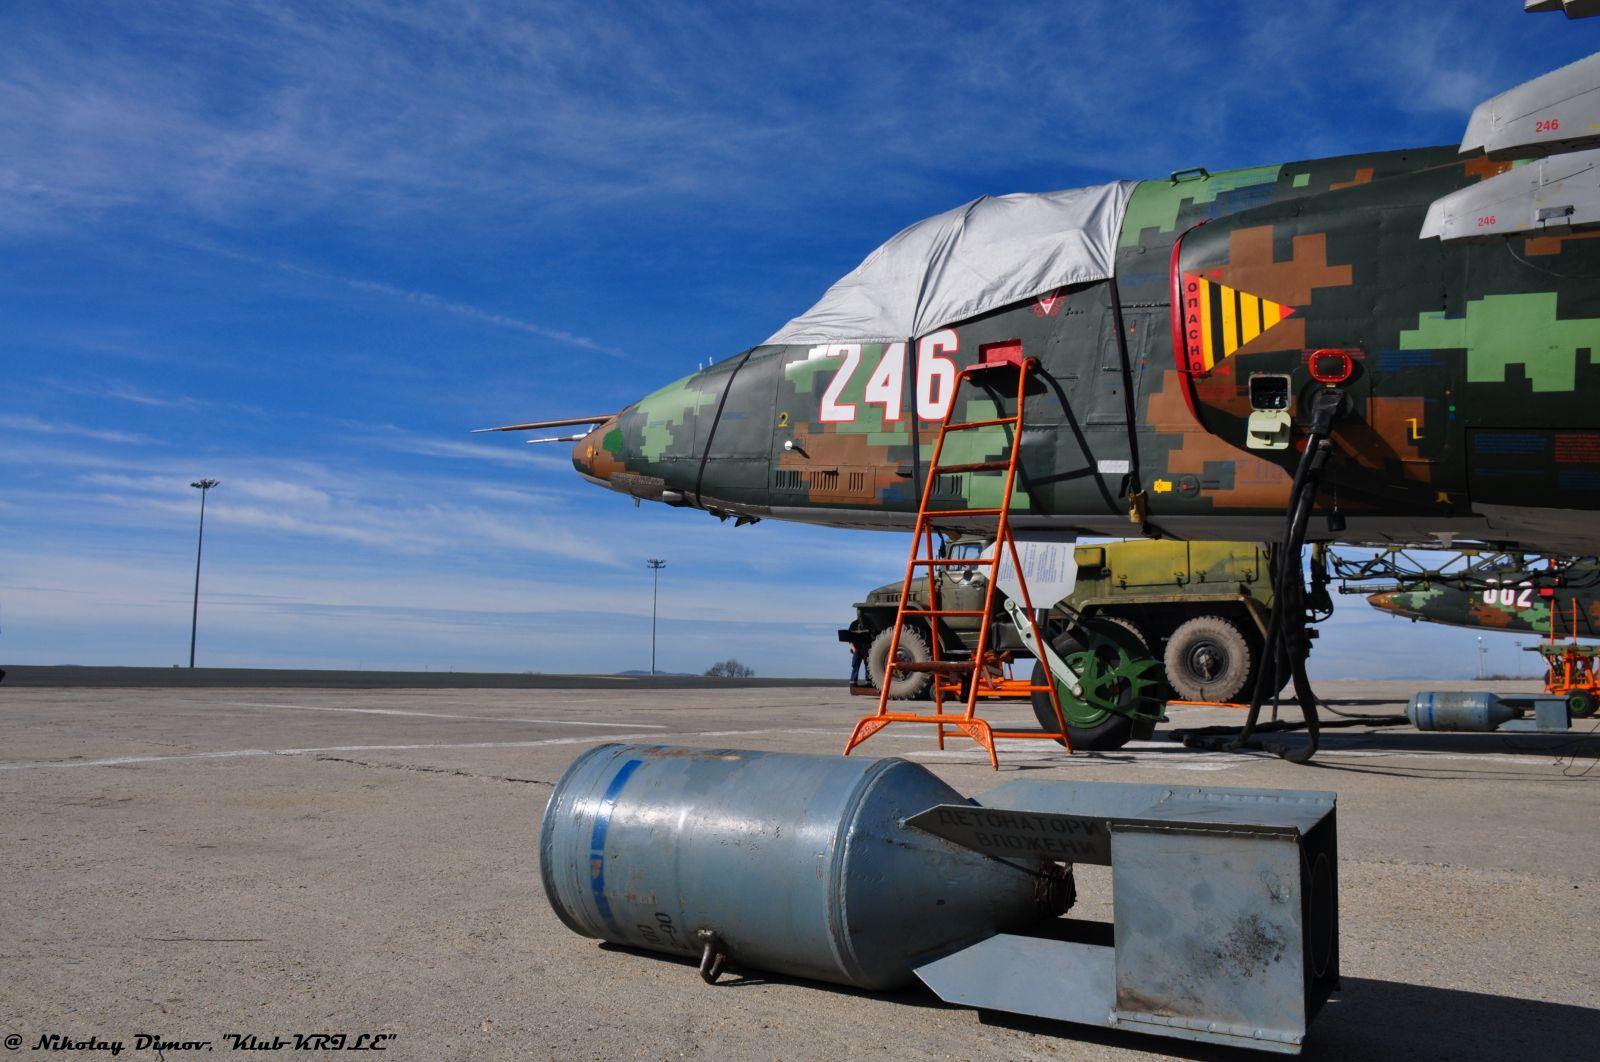 Авиобаза Безмер – полети, полети, полети (фотогалерия)